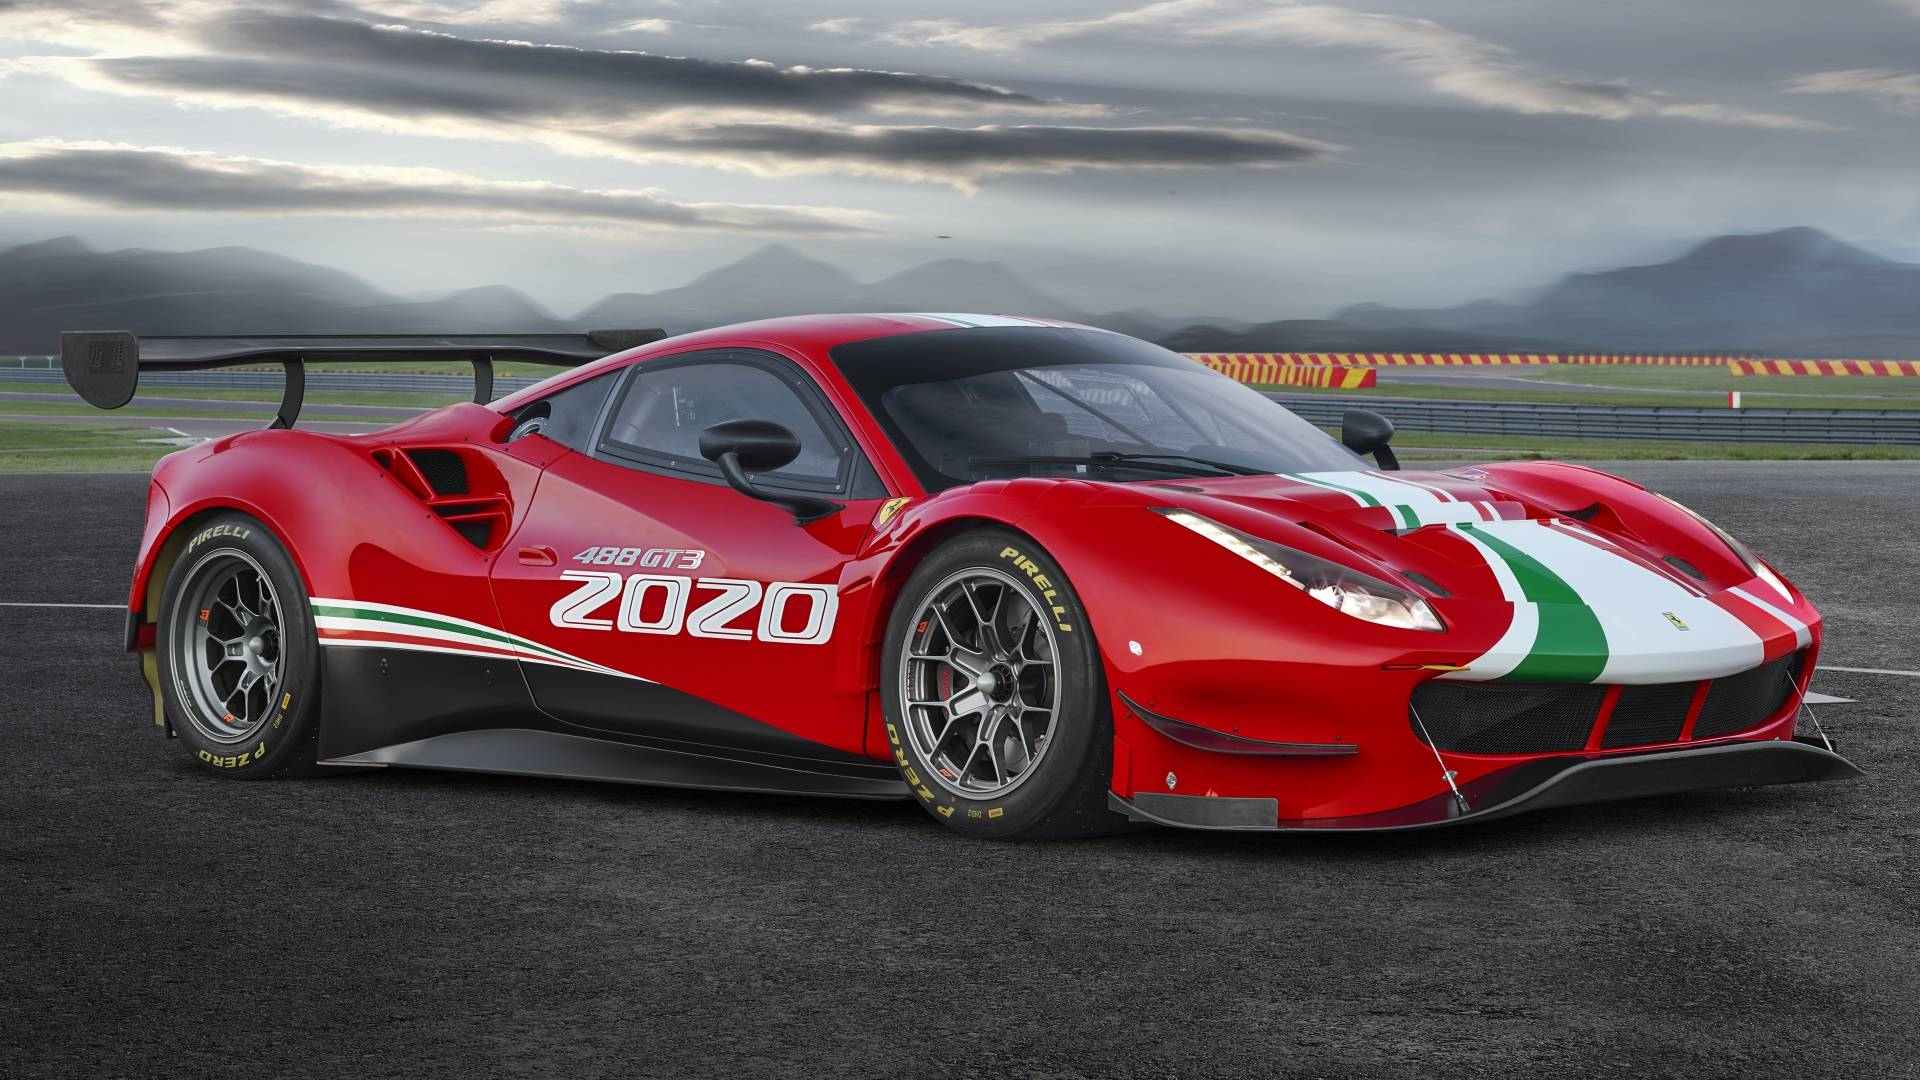 2020 Ferrari 488 GT3 Evo Debuts With Aero Upgrades Longer Wheelbase 1920x1080